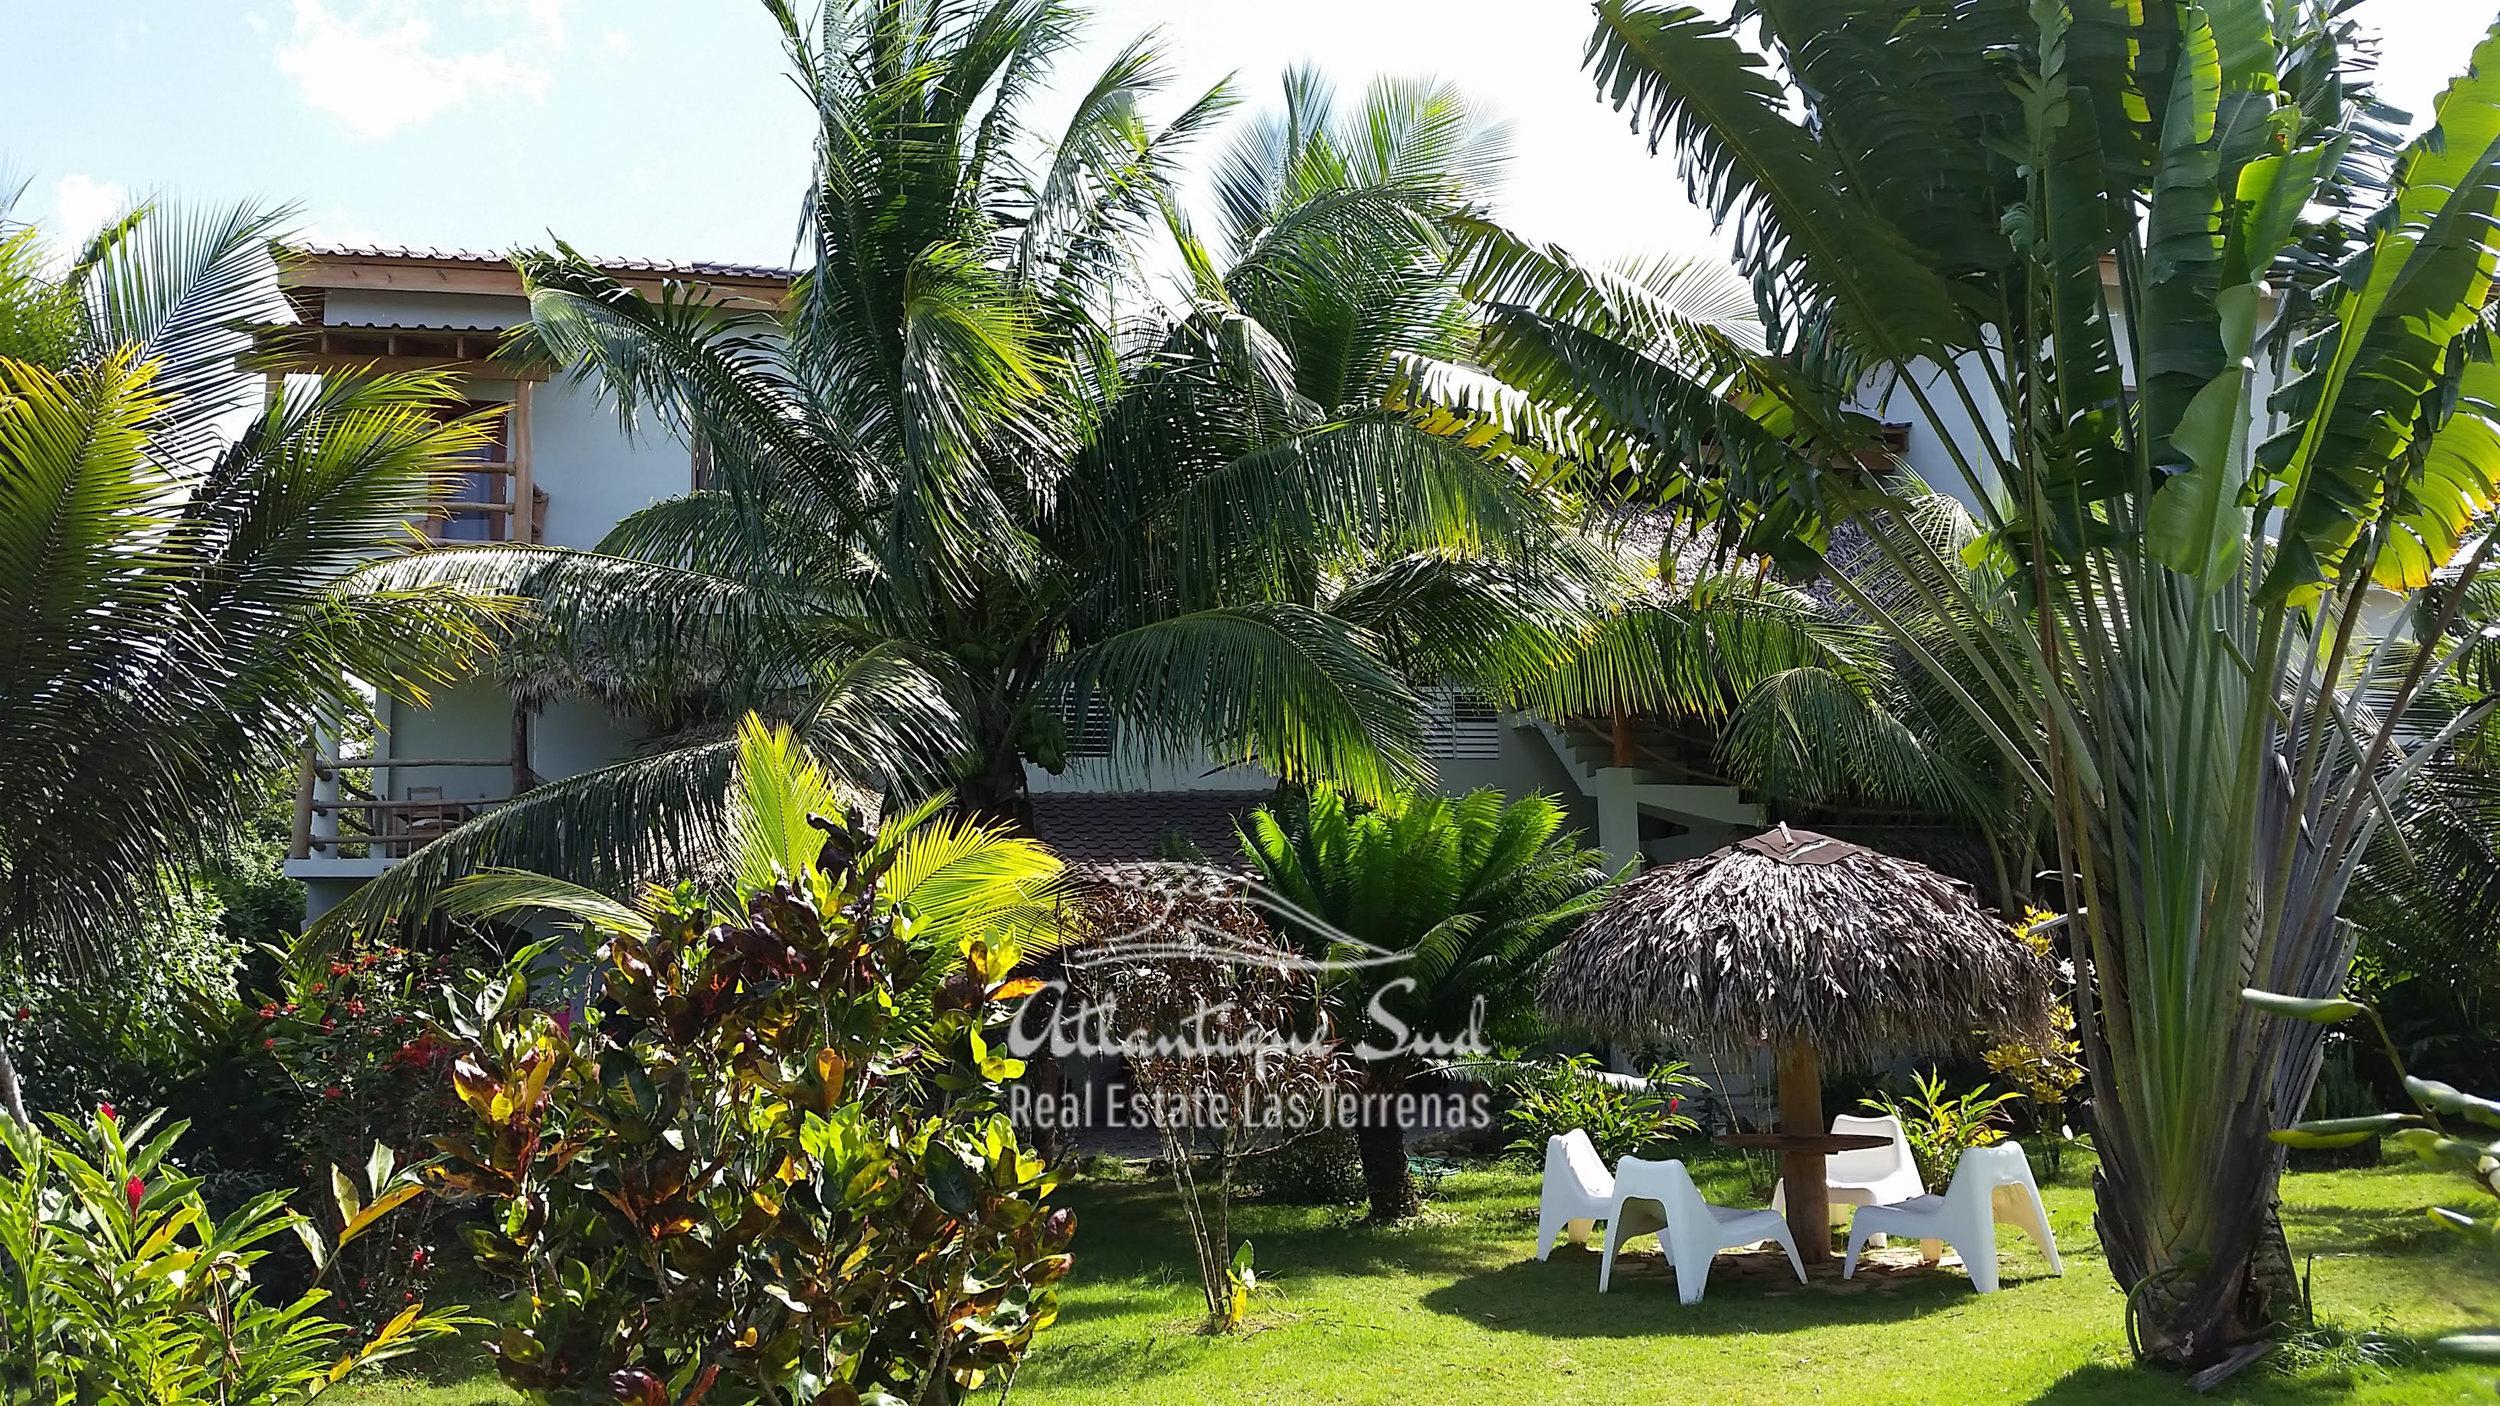 Typical caribbean hotel for sale Real Estate Las Terrenas Dominican Republic Atlantique Sud33.jpg